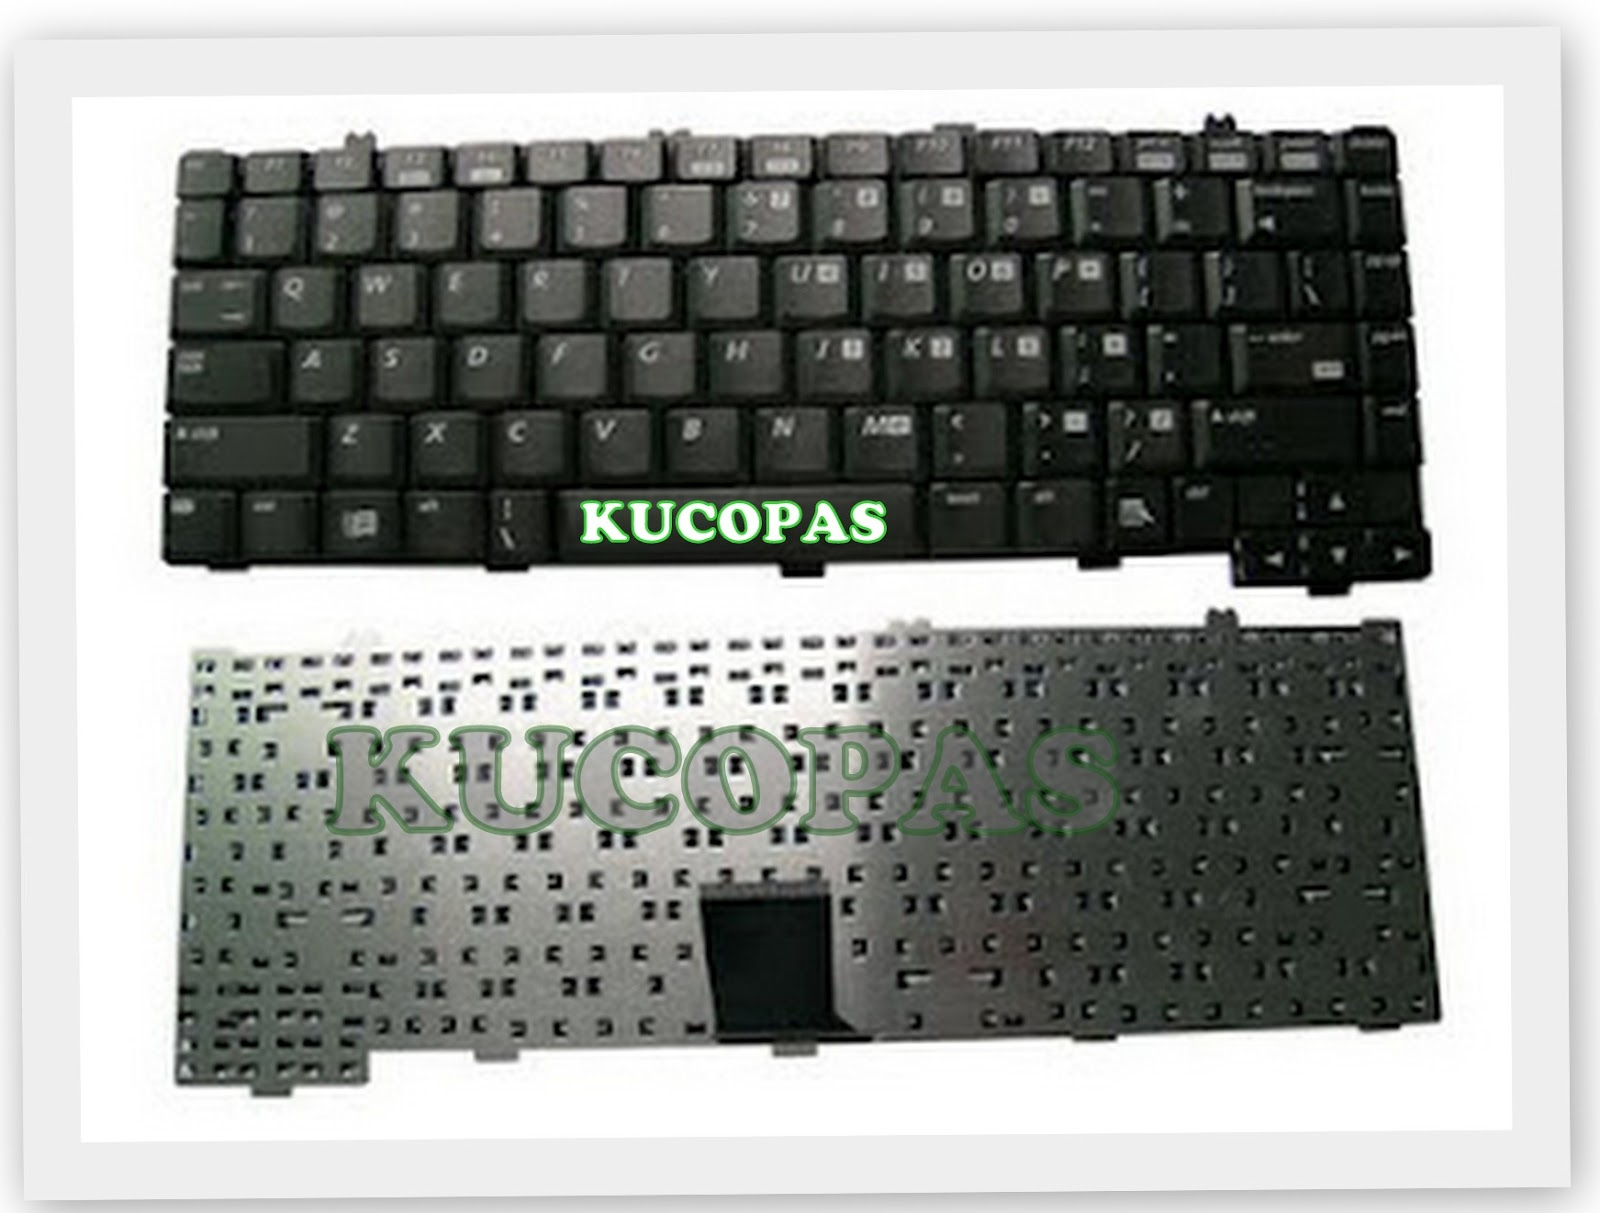 Cara Memperbaiki Keyboard Notebook Atau Laptop Yang Error Kucopas